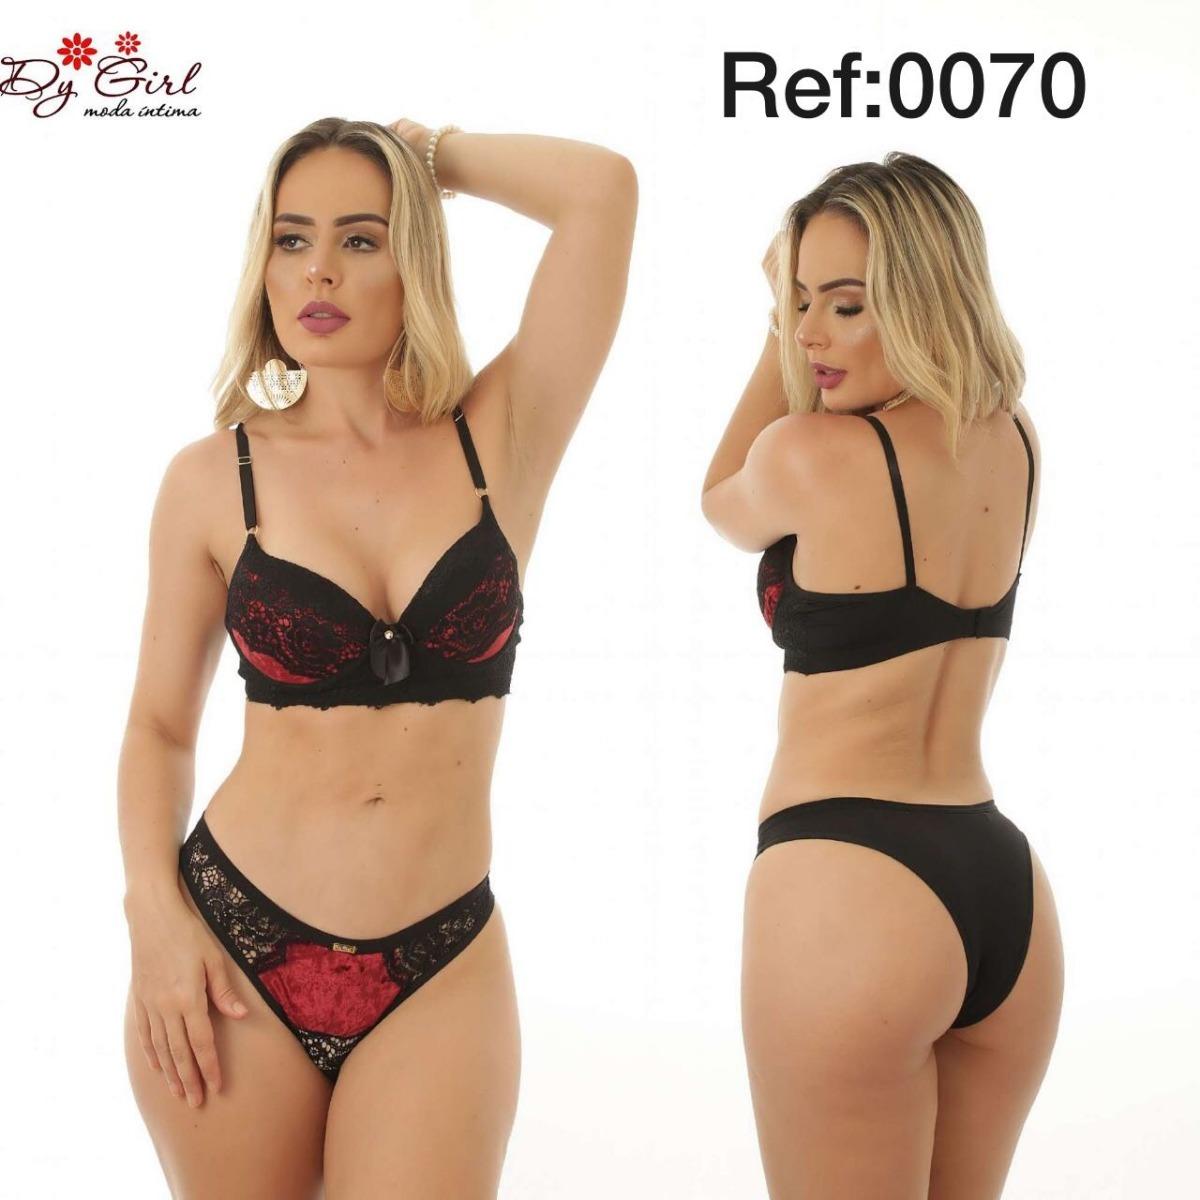 d5bdcd849 kit 10 conjuntos lingerie renda micro luxo atacado revenda. Carregando zoom.